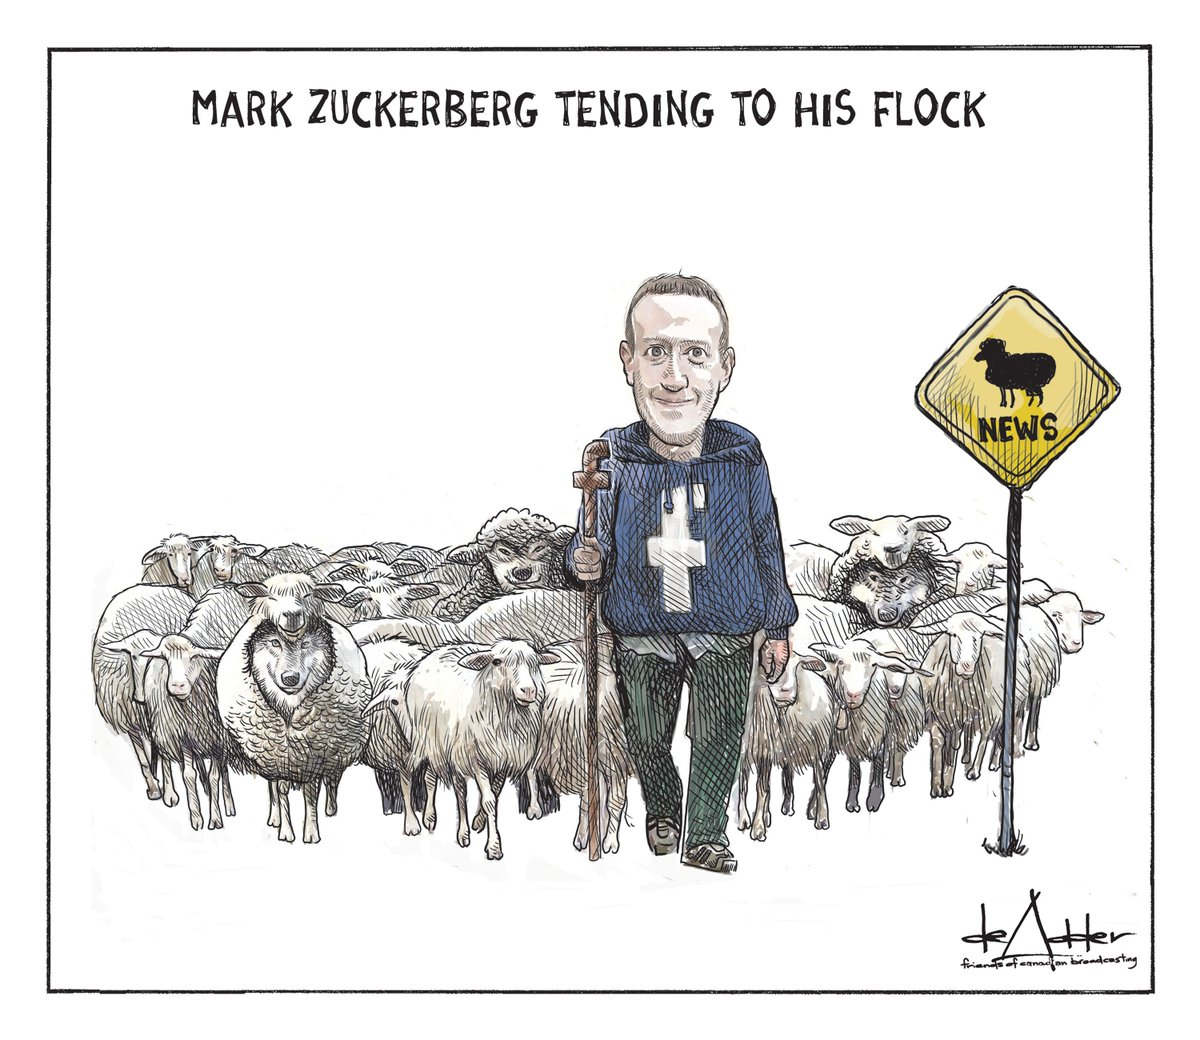 Cartoons I've drawn for @friendscb #facebook #twitter #socialmedia #FakeNews #userdata #Zuckerberg #MarkZuckerberg